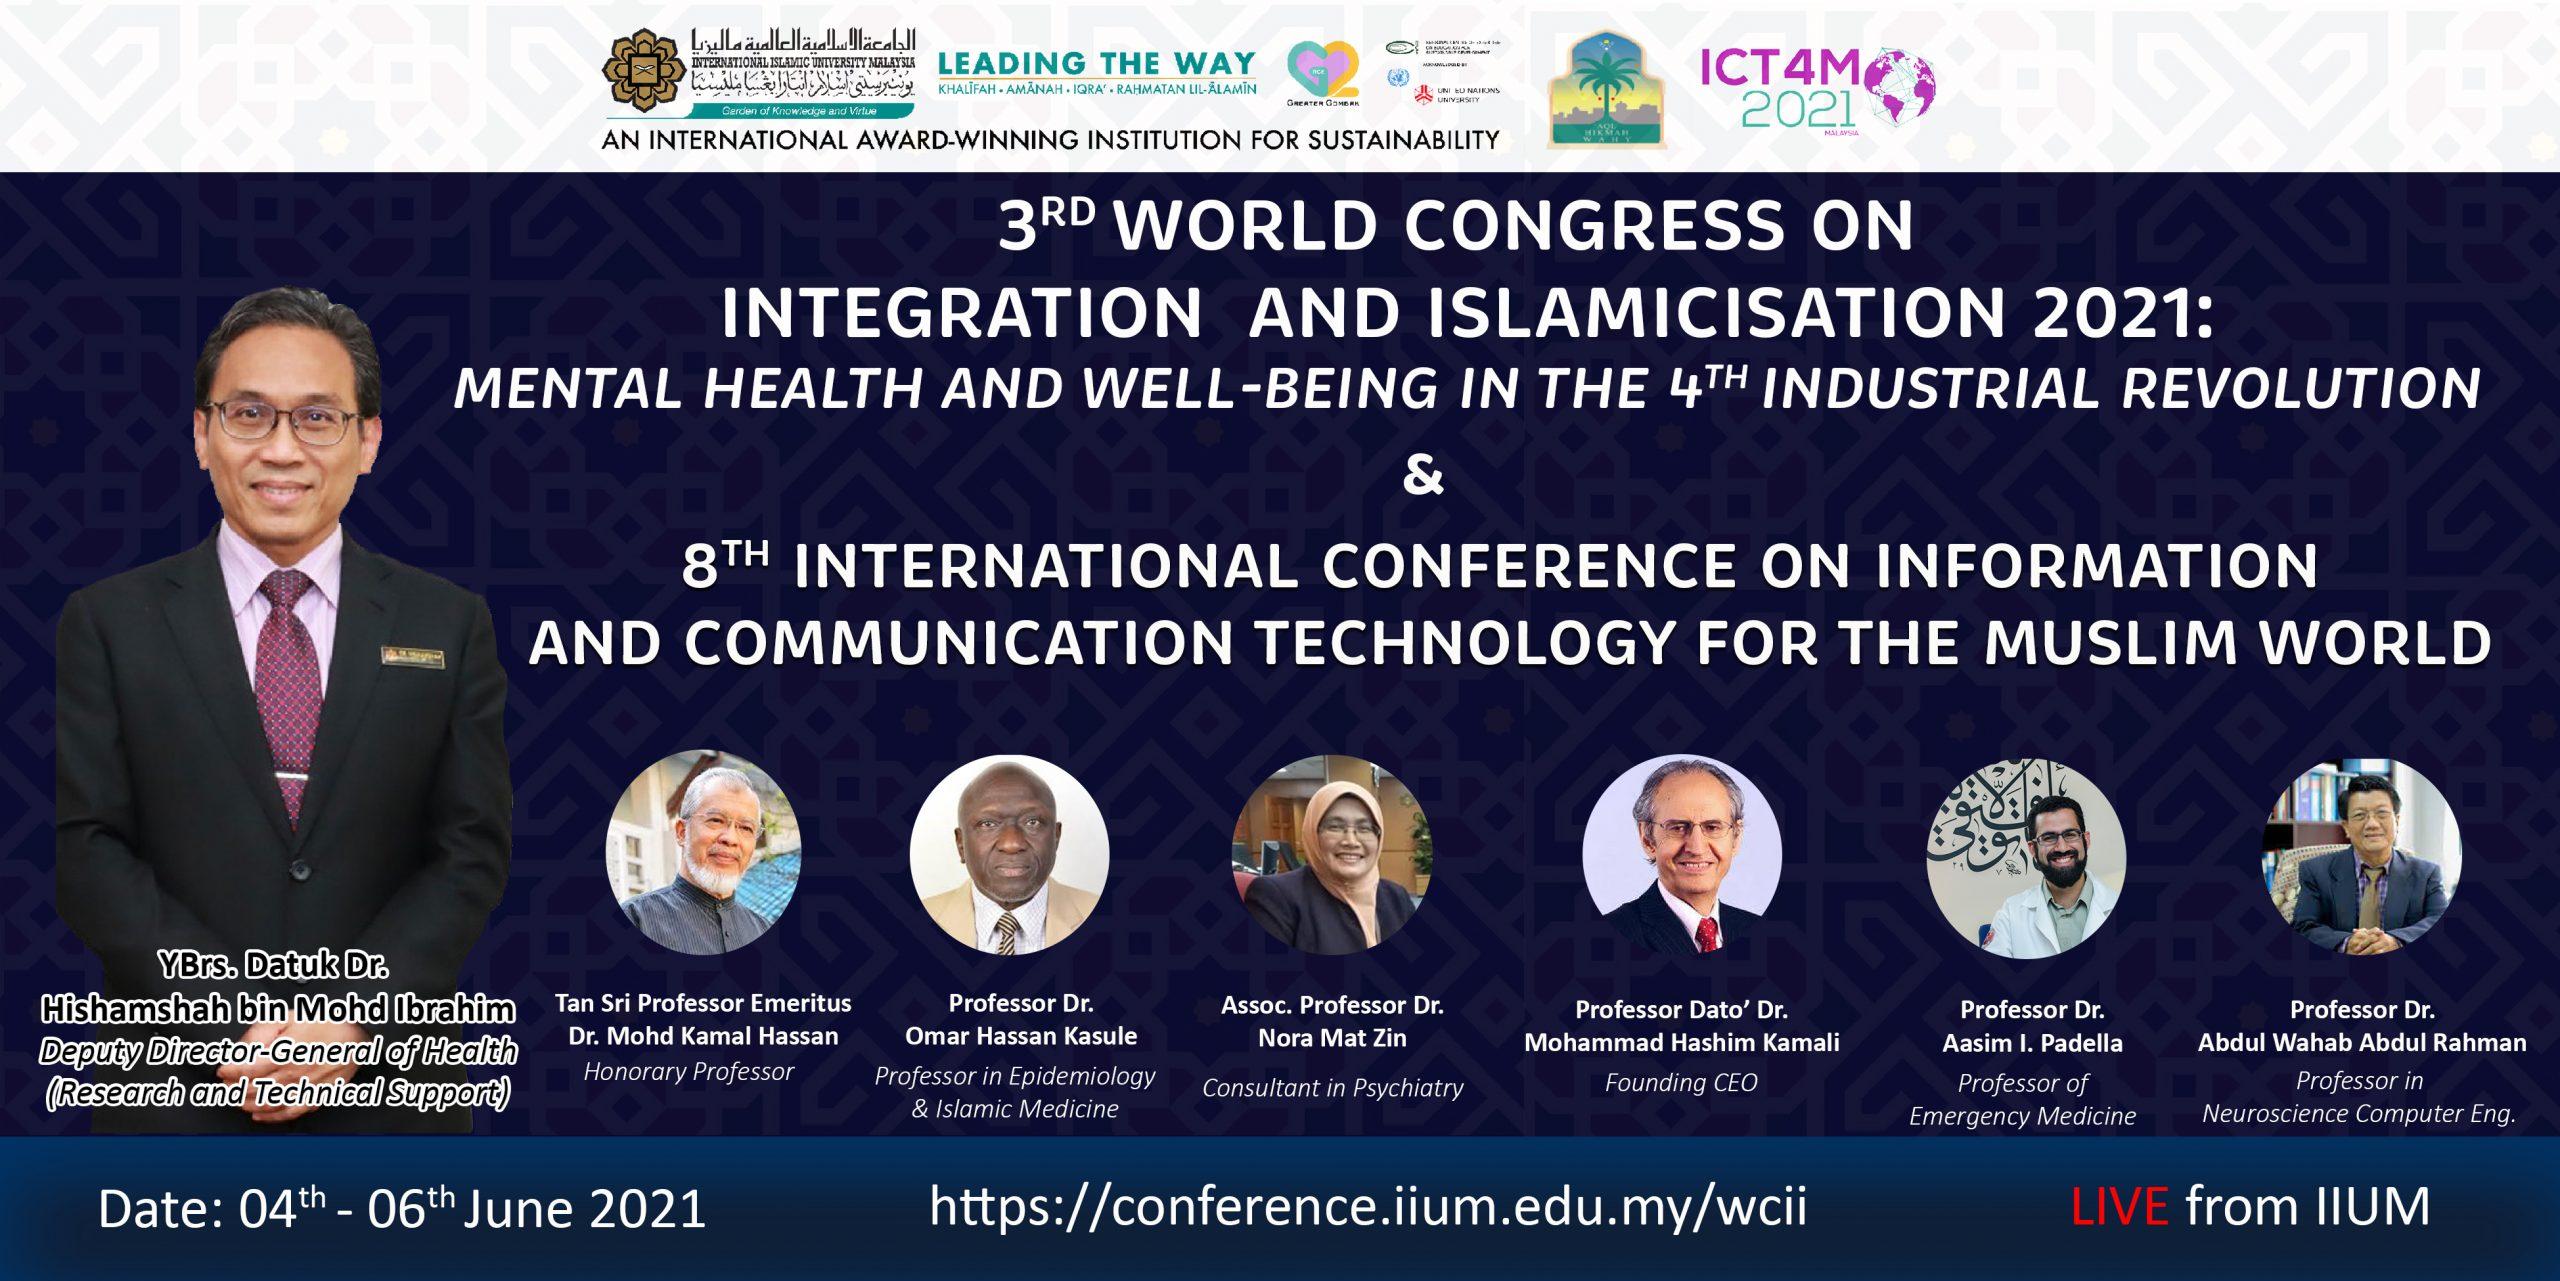 3rd World Congress on Integration & Islamicisation 2021 (3WCII) 4th - 6th June 201